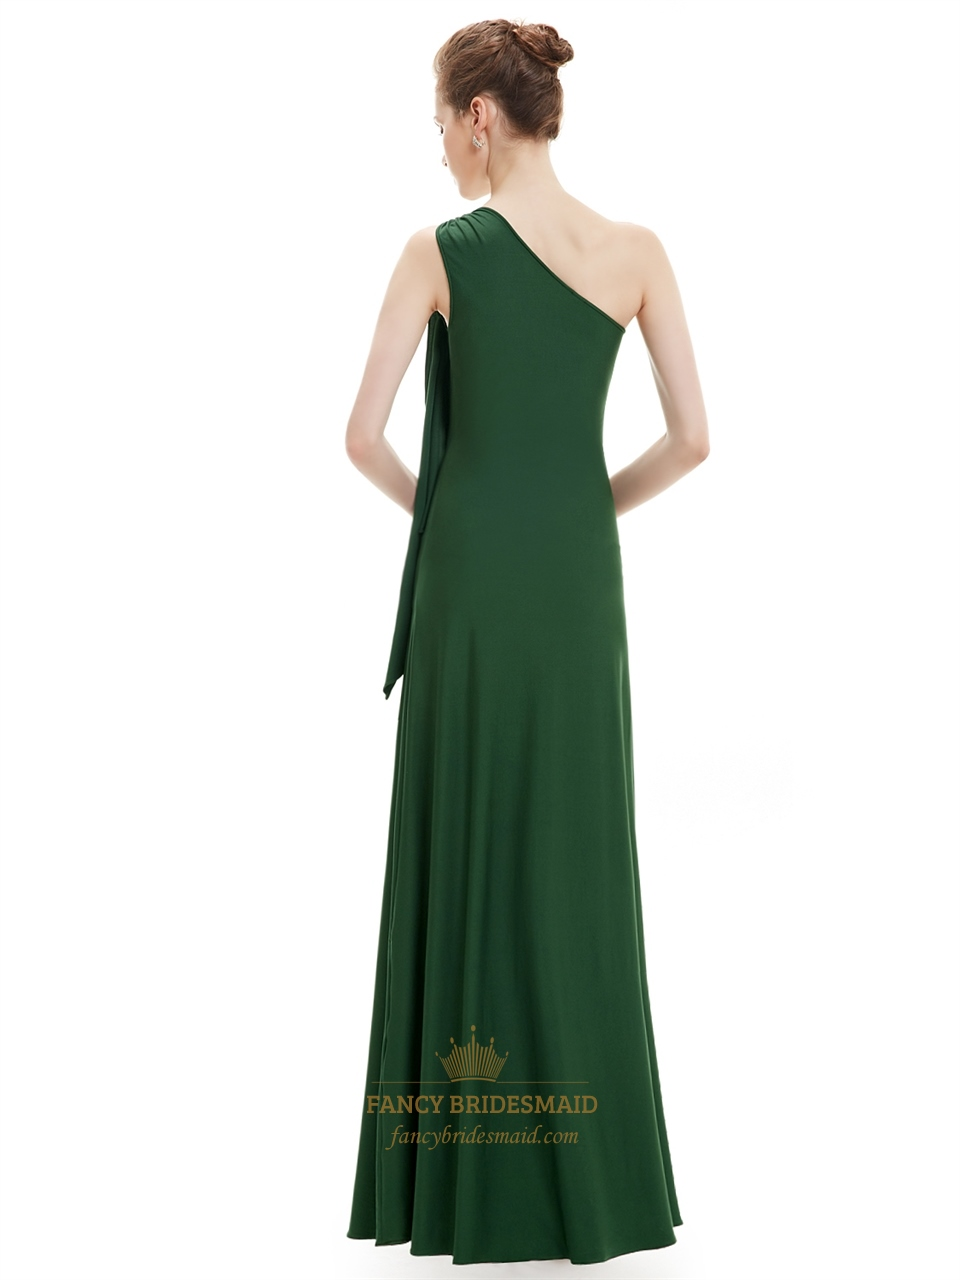 Emerald green sheath one shoulder bridesmaid dresses with ruffle emerald green sheath one shoulder bridesmaid dresses with ruffle detail ombrellifo Gallery